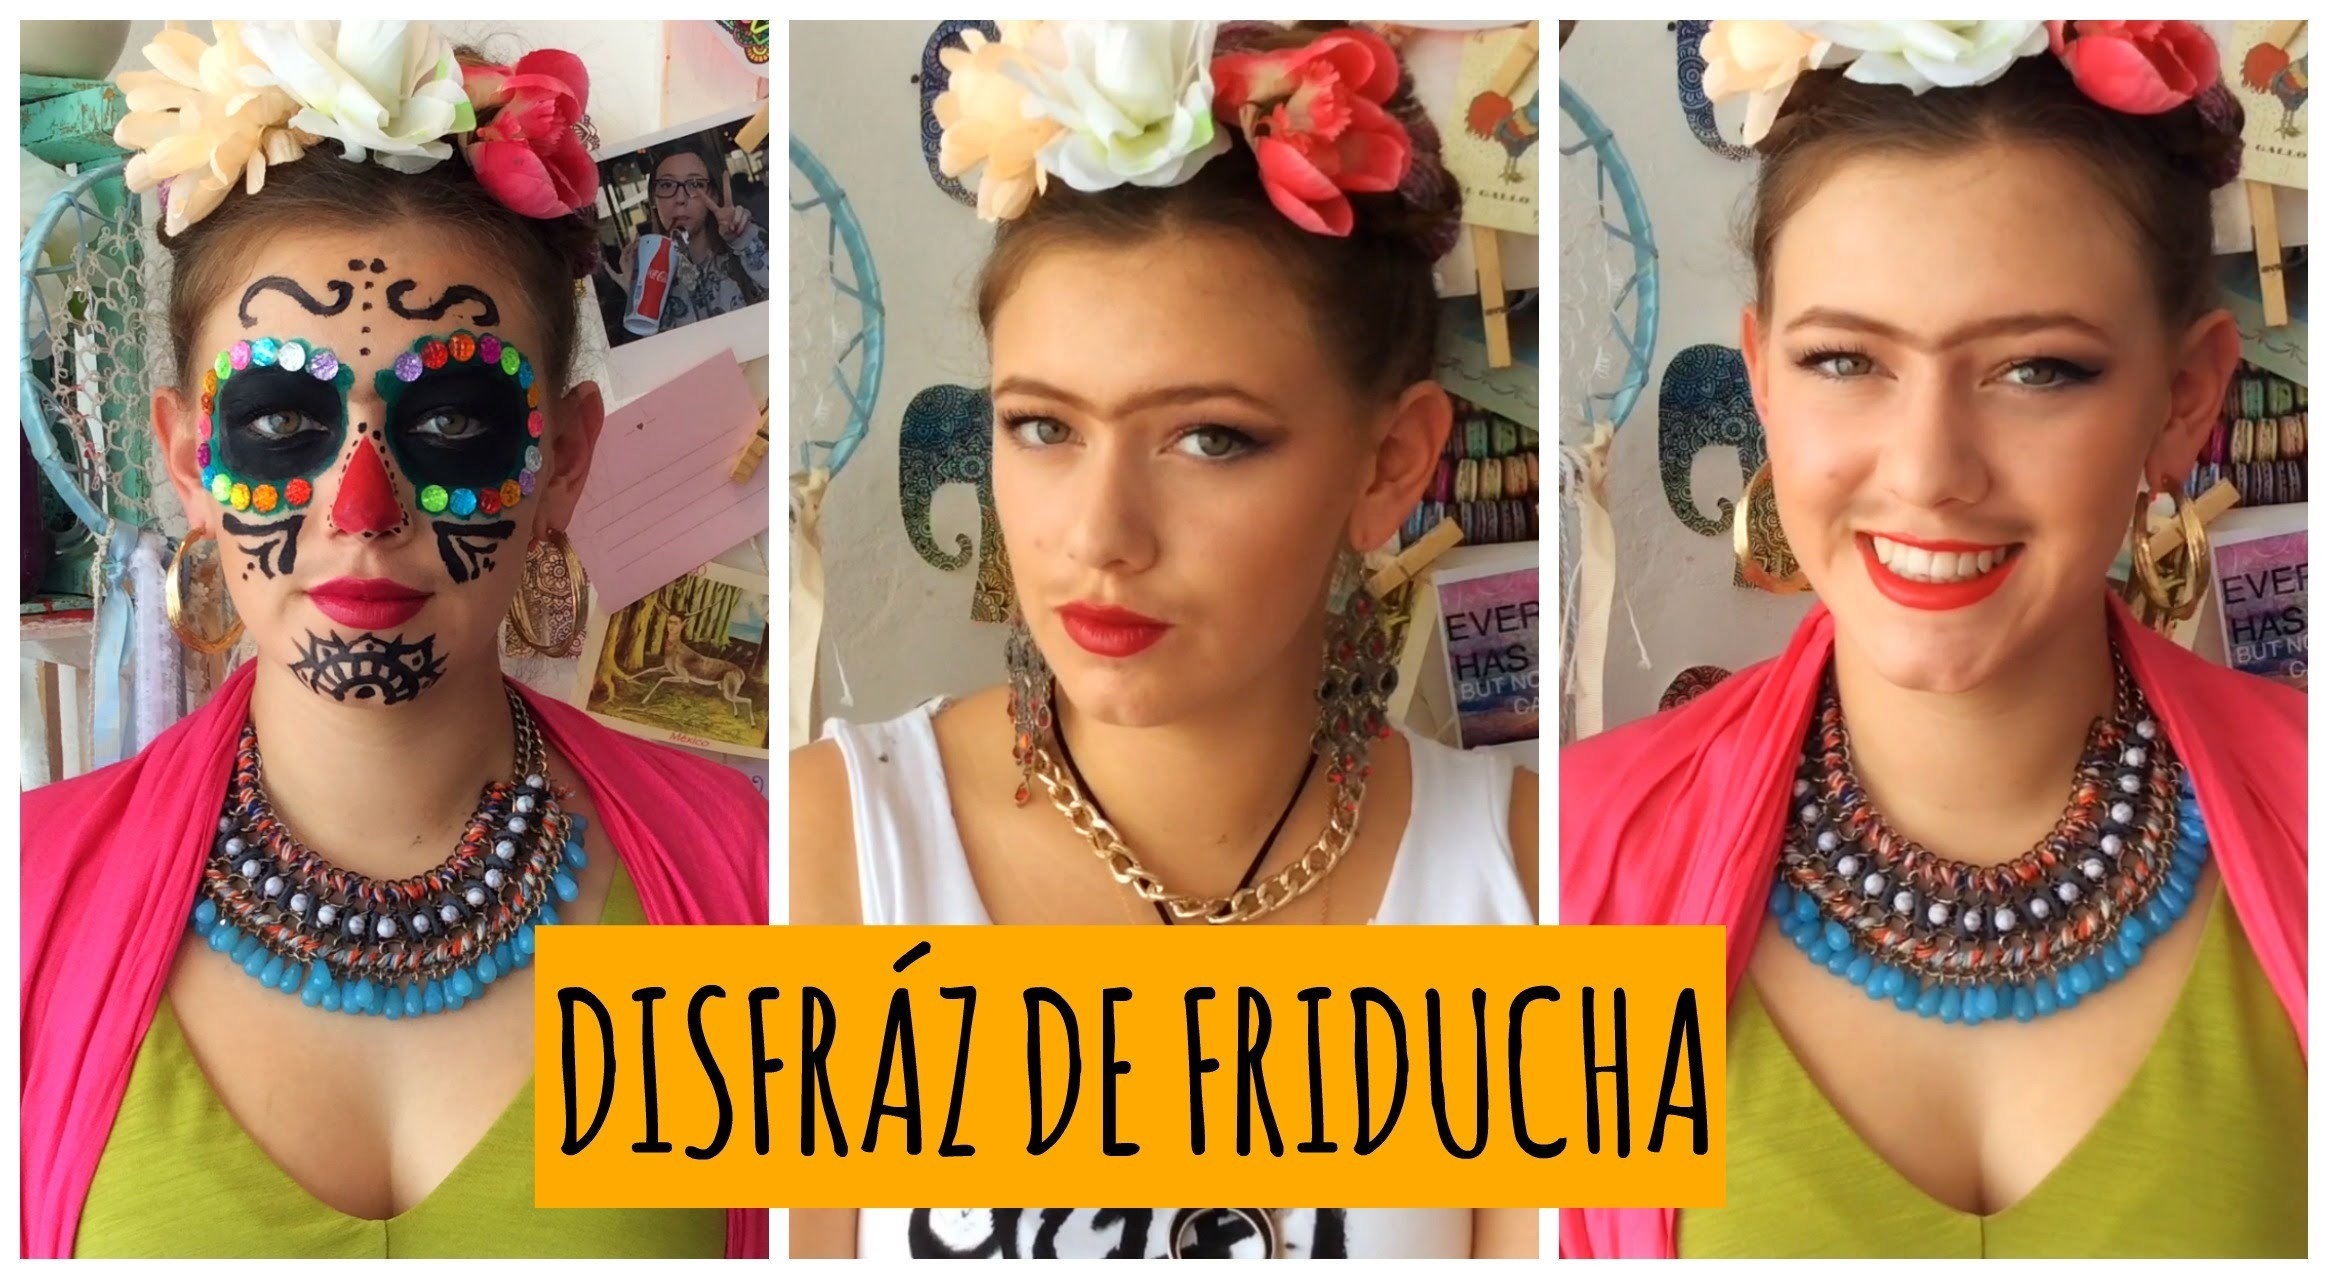 Disfrazate de Frida Kahlo | 3 ideas! | DIY